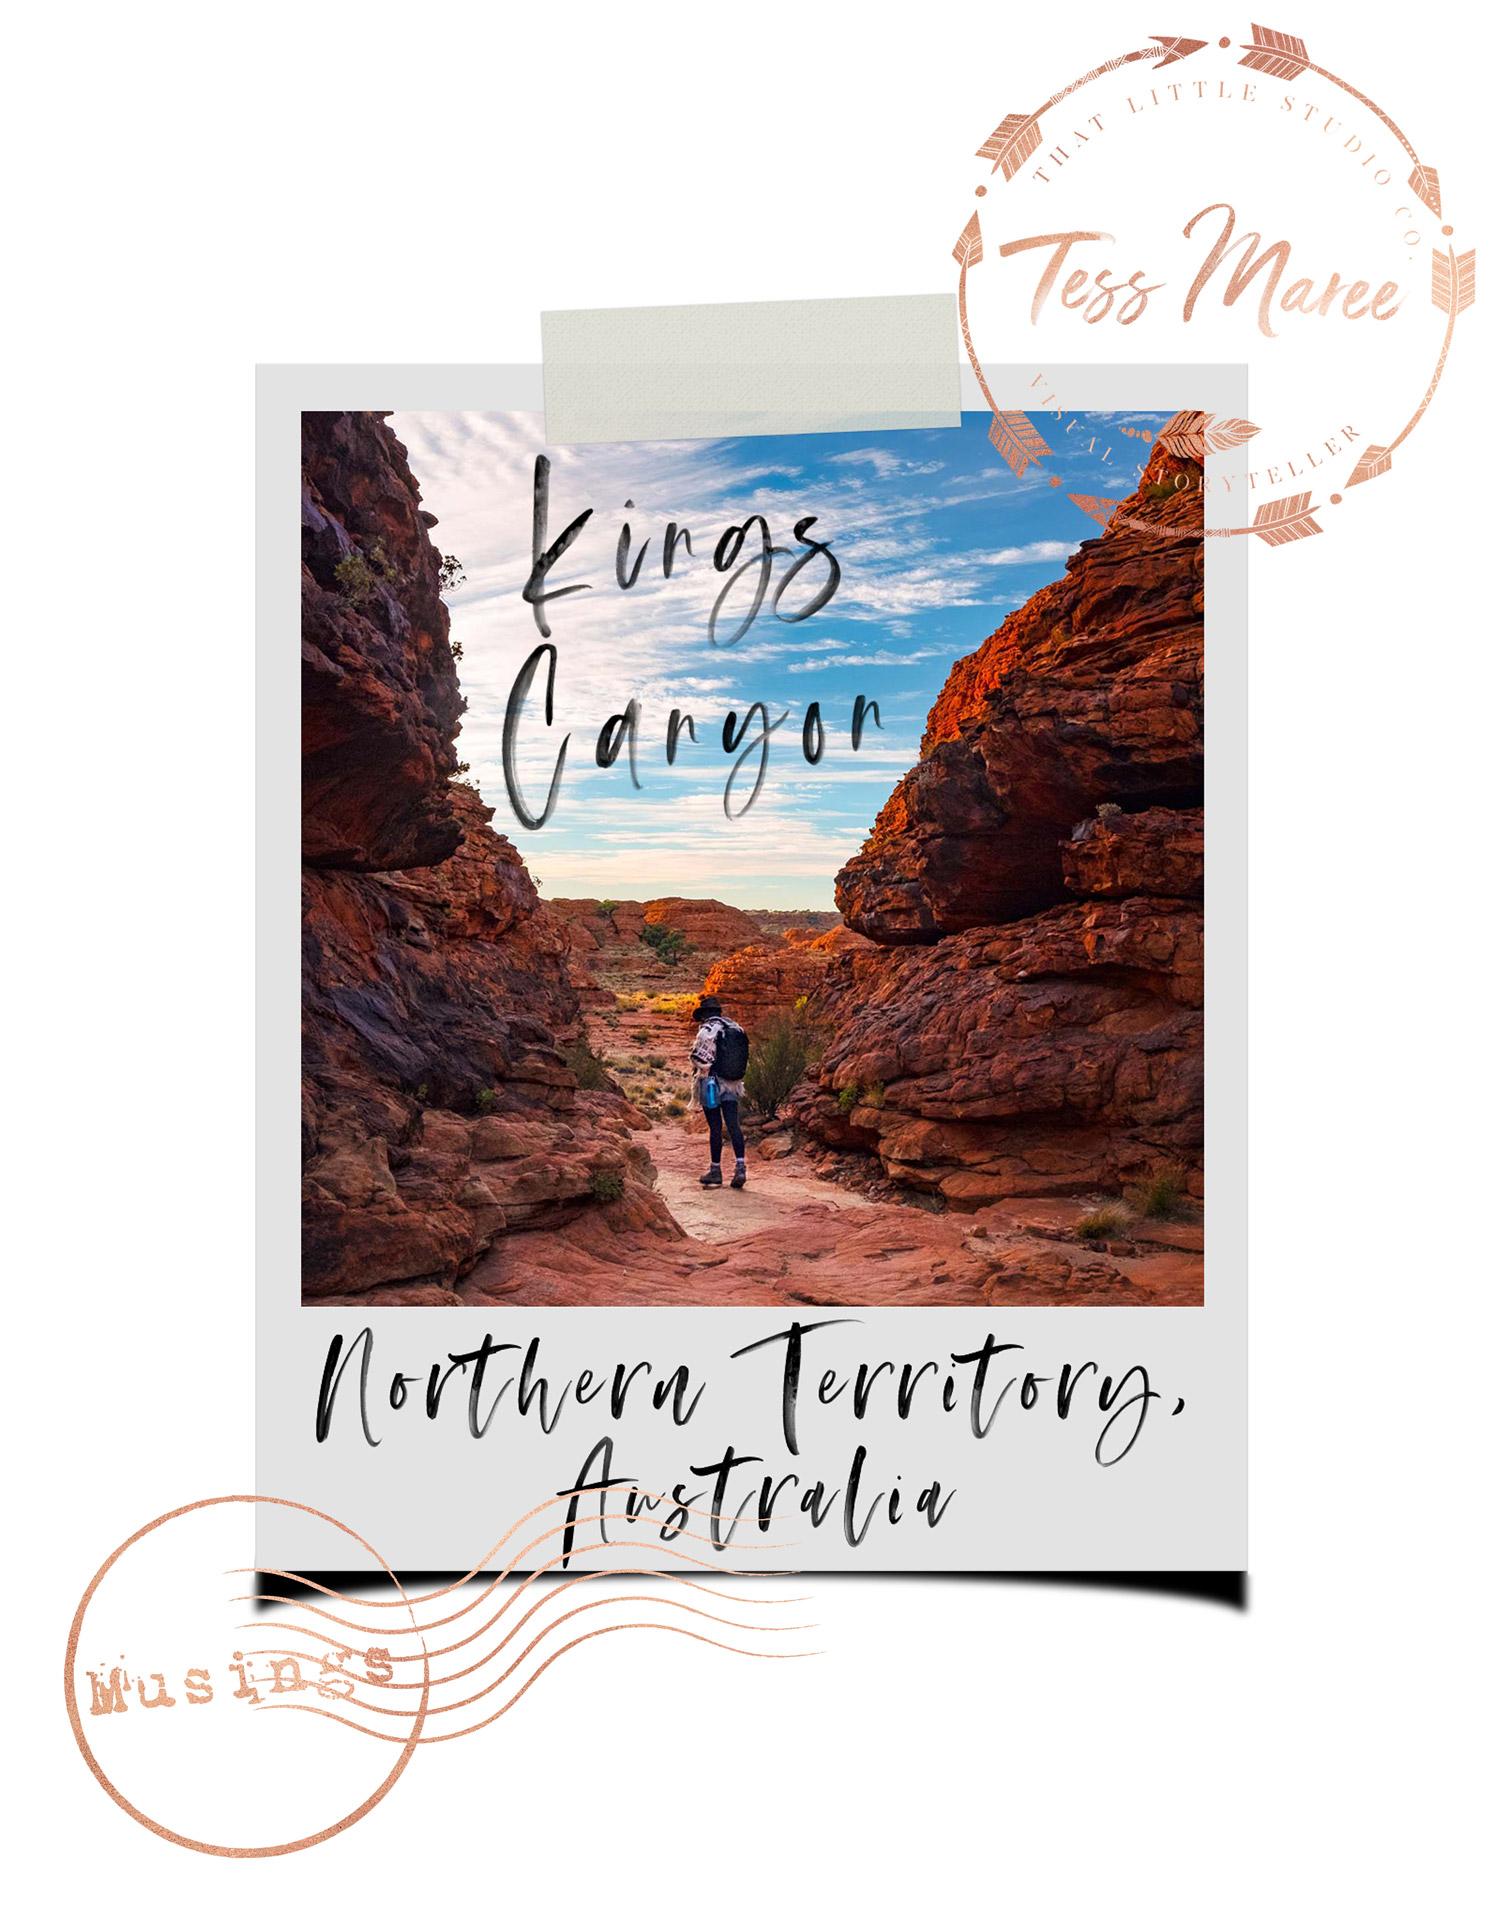 Tess-Maree-Musing-Kings-Canyon-Northern-Territory-Australia-Polaroid